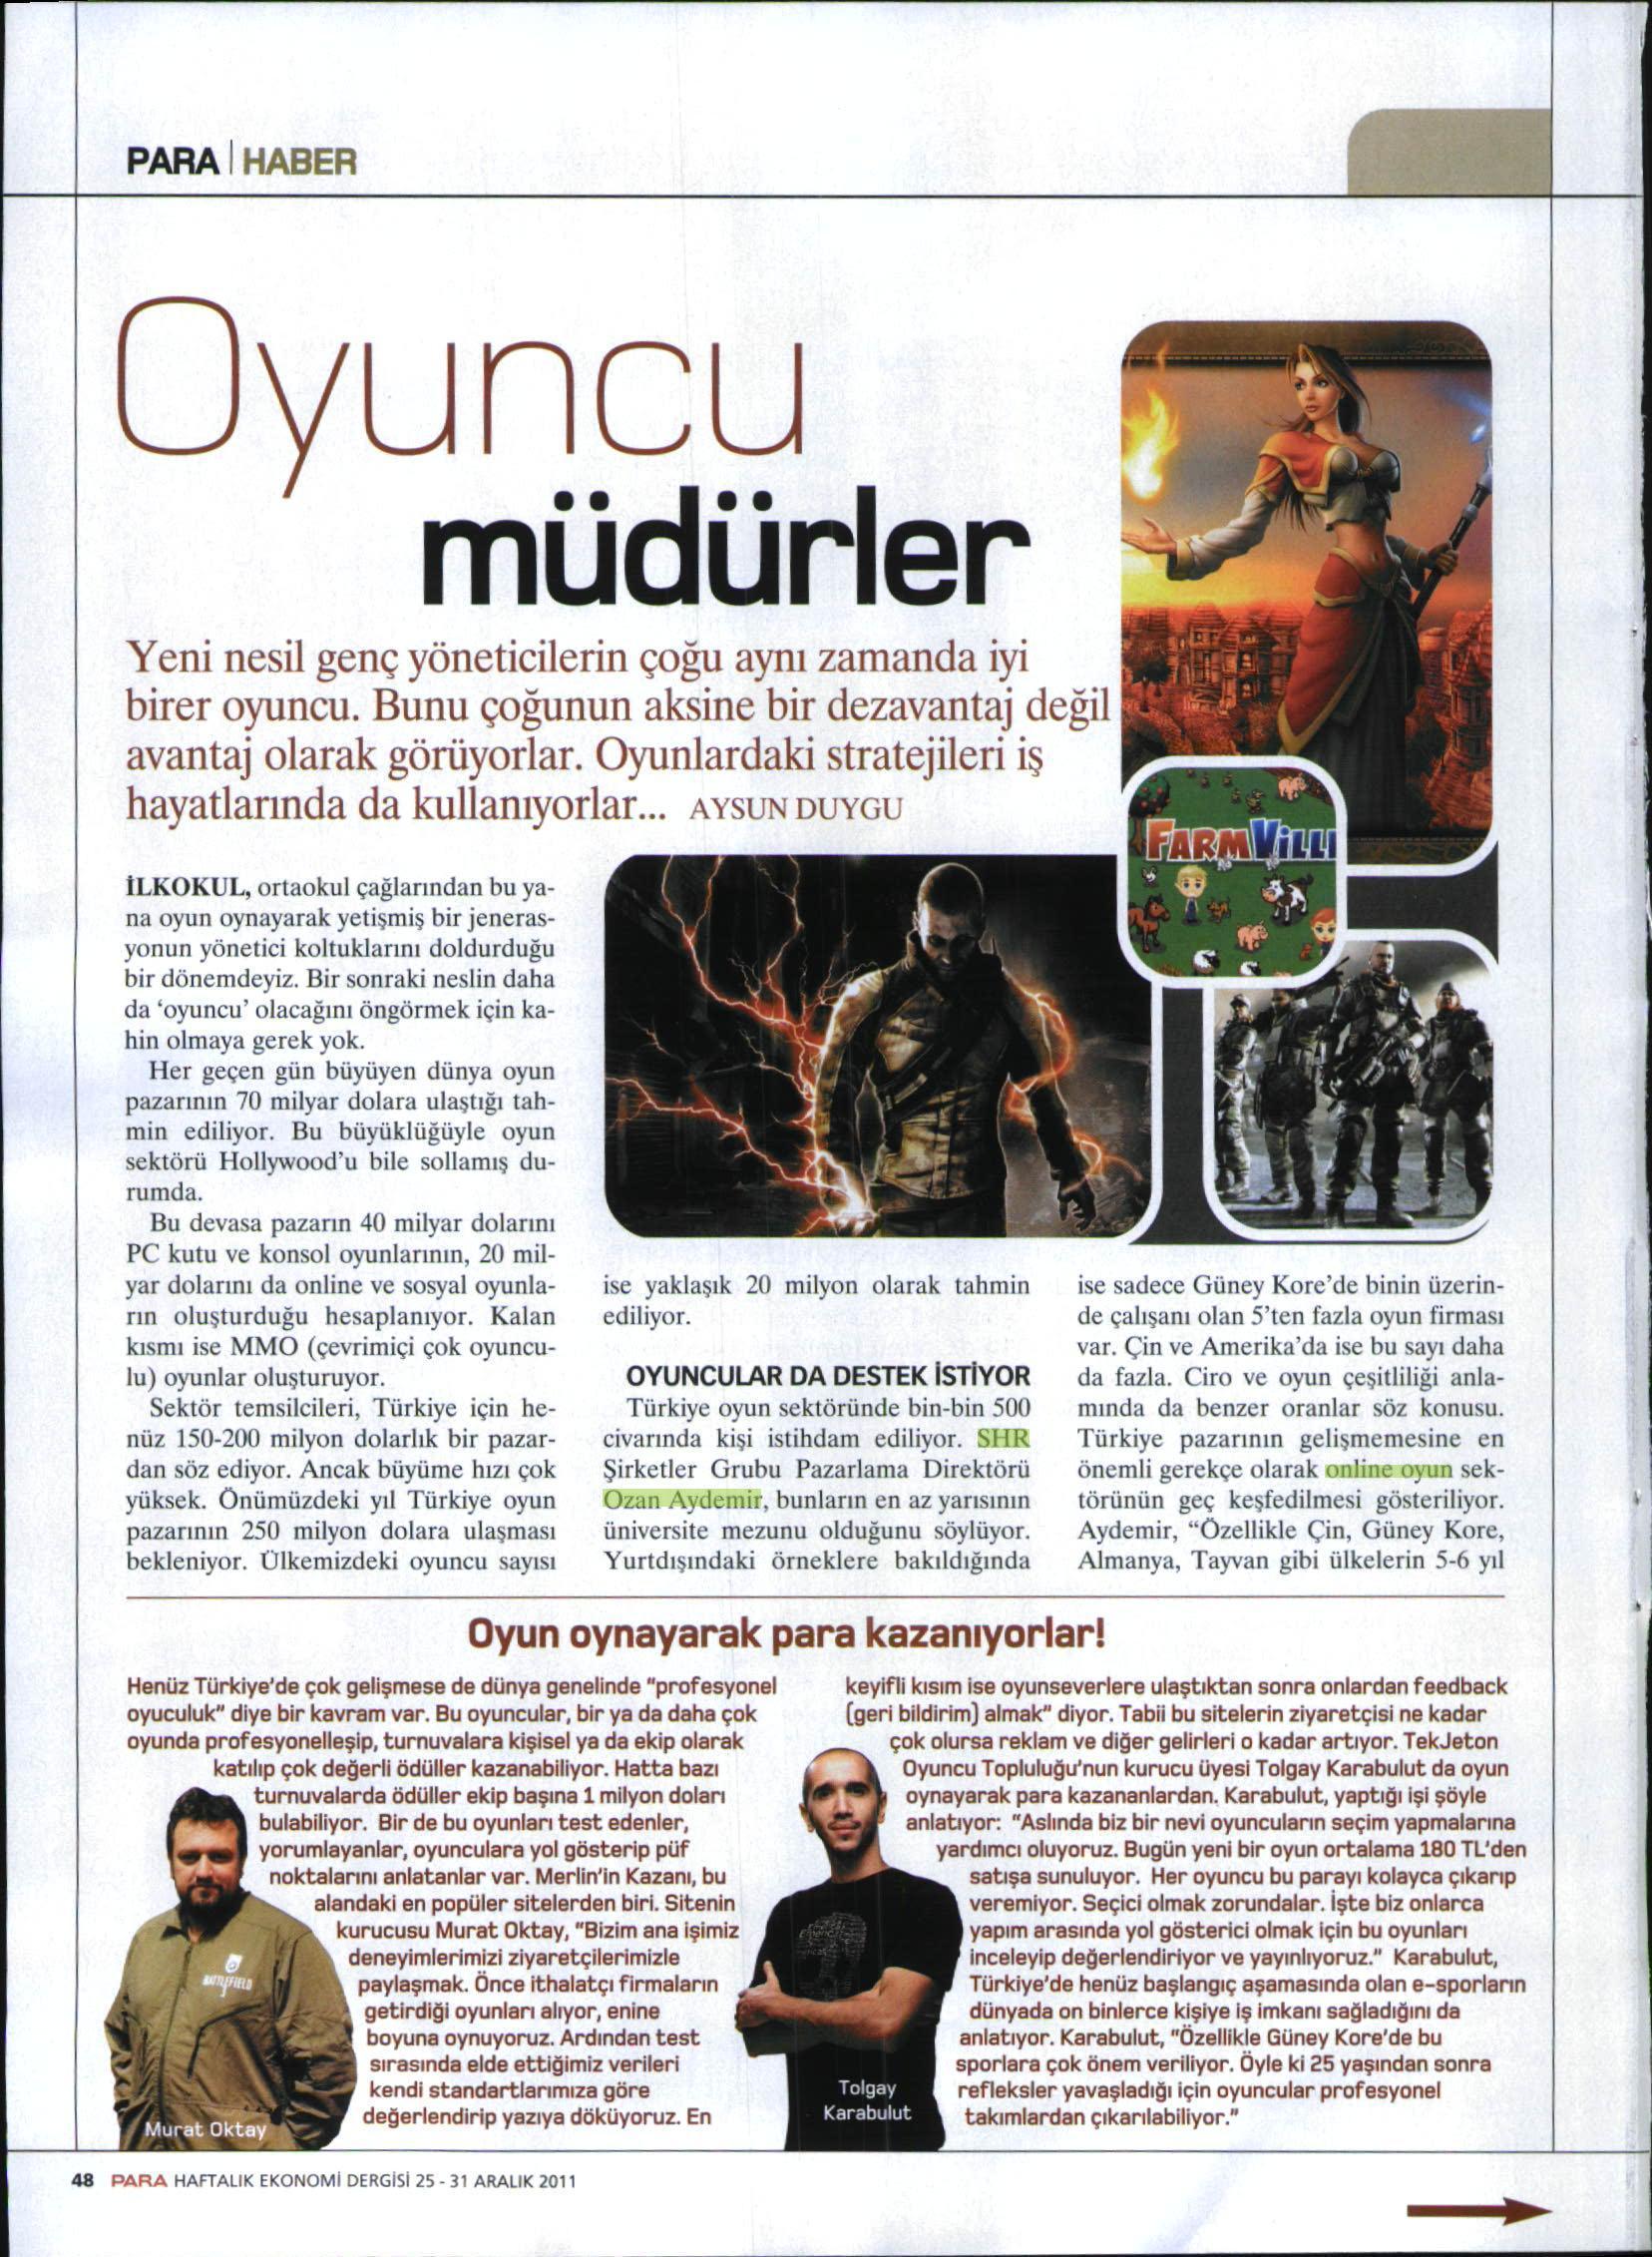 Netmarble-Turkey-Basin-Yansimasi-Para-Dergi-25-Aralik-2011-1